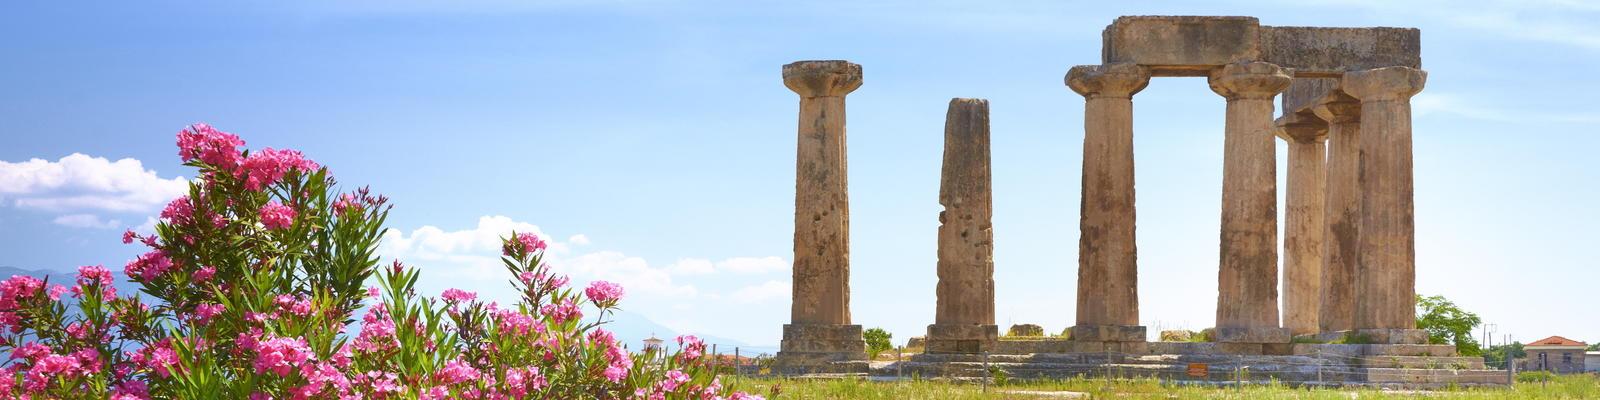 Ruins of the Temple of Apollo, Corinth, Peloponnese, Greece (Photo: John_Walker/Shutterstock)